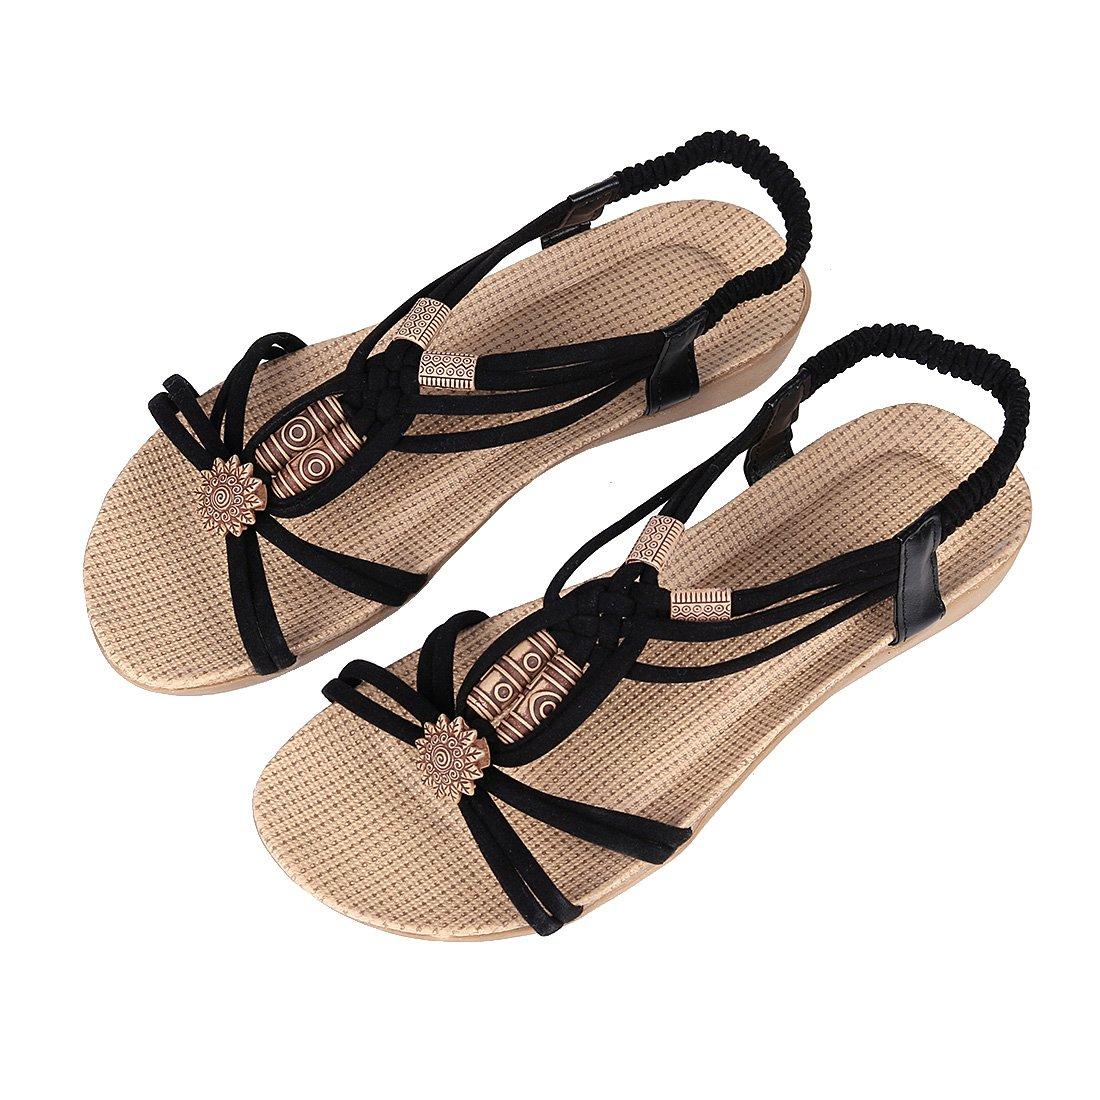 Women's Vintage Flat Sandal Summer Beach Peep Toe Strap Sandals H38